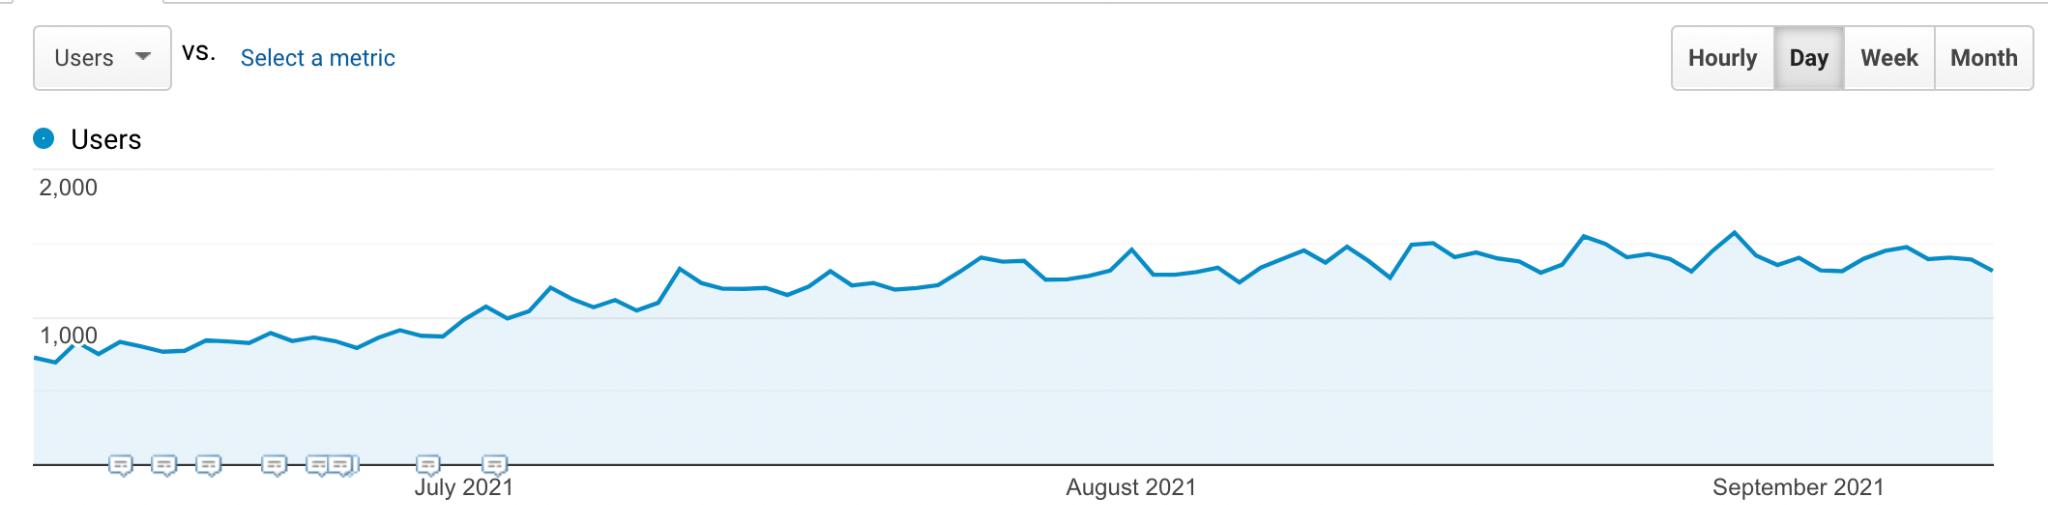 Gradually increasing traffic chart over three months